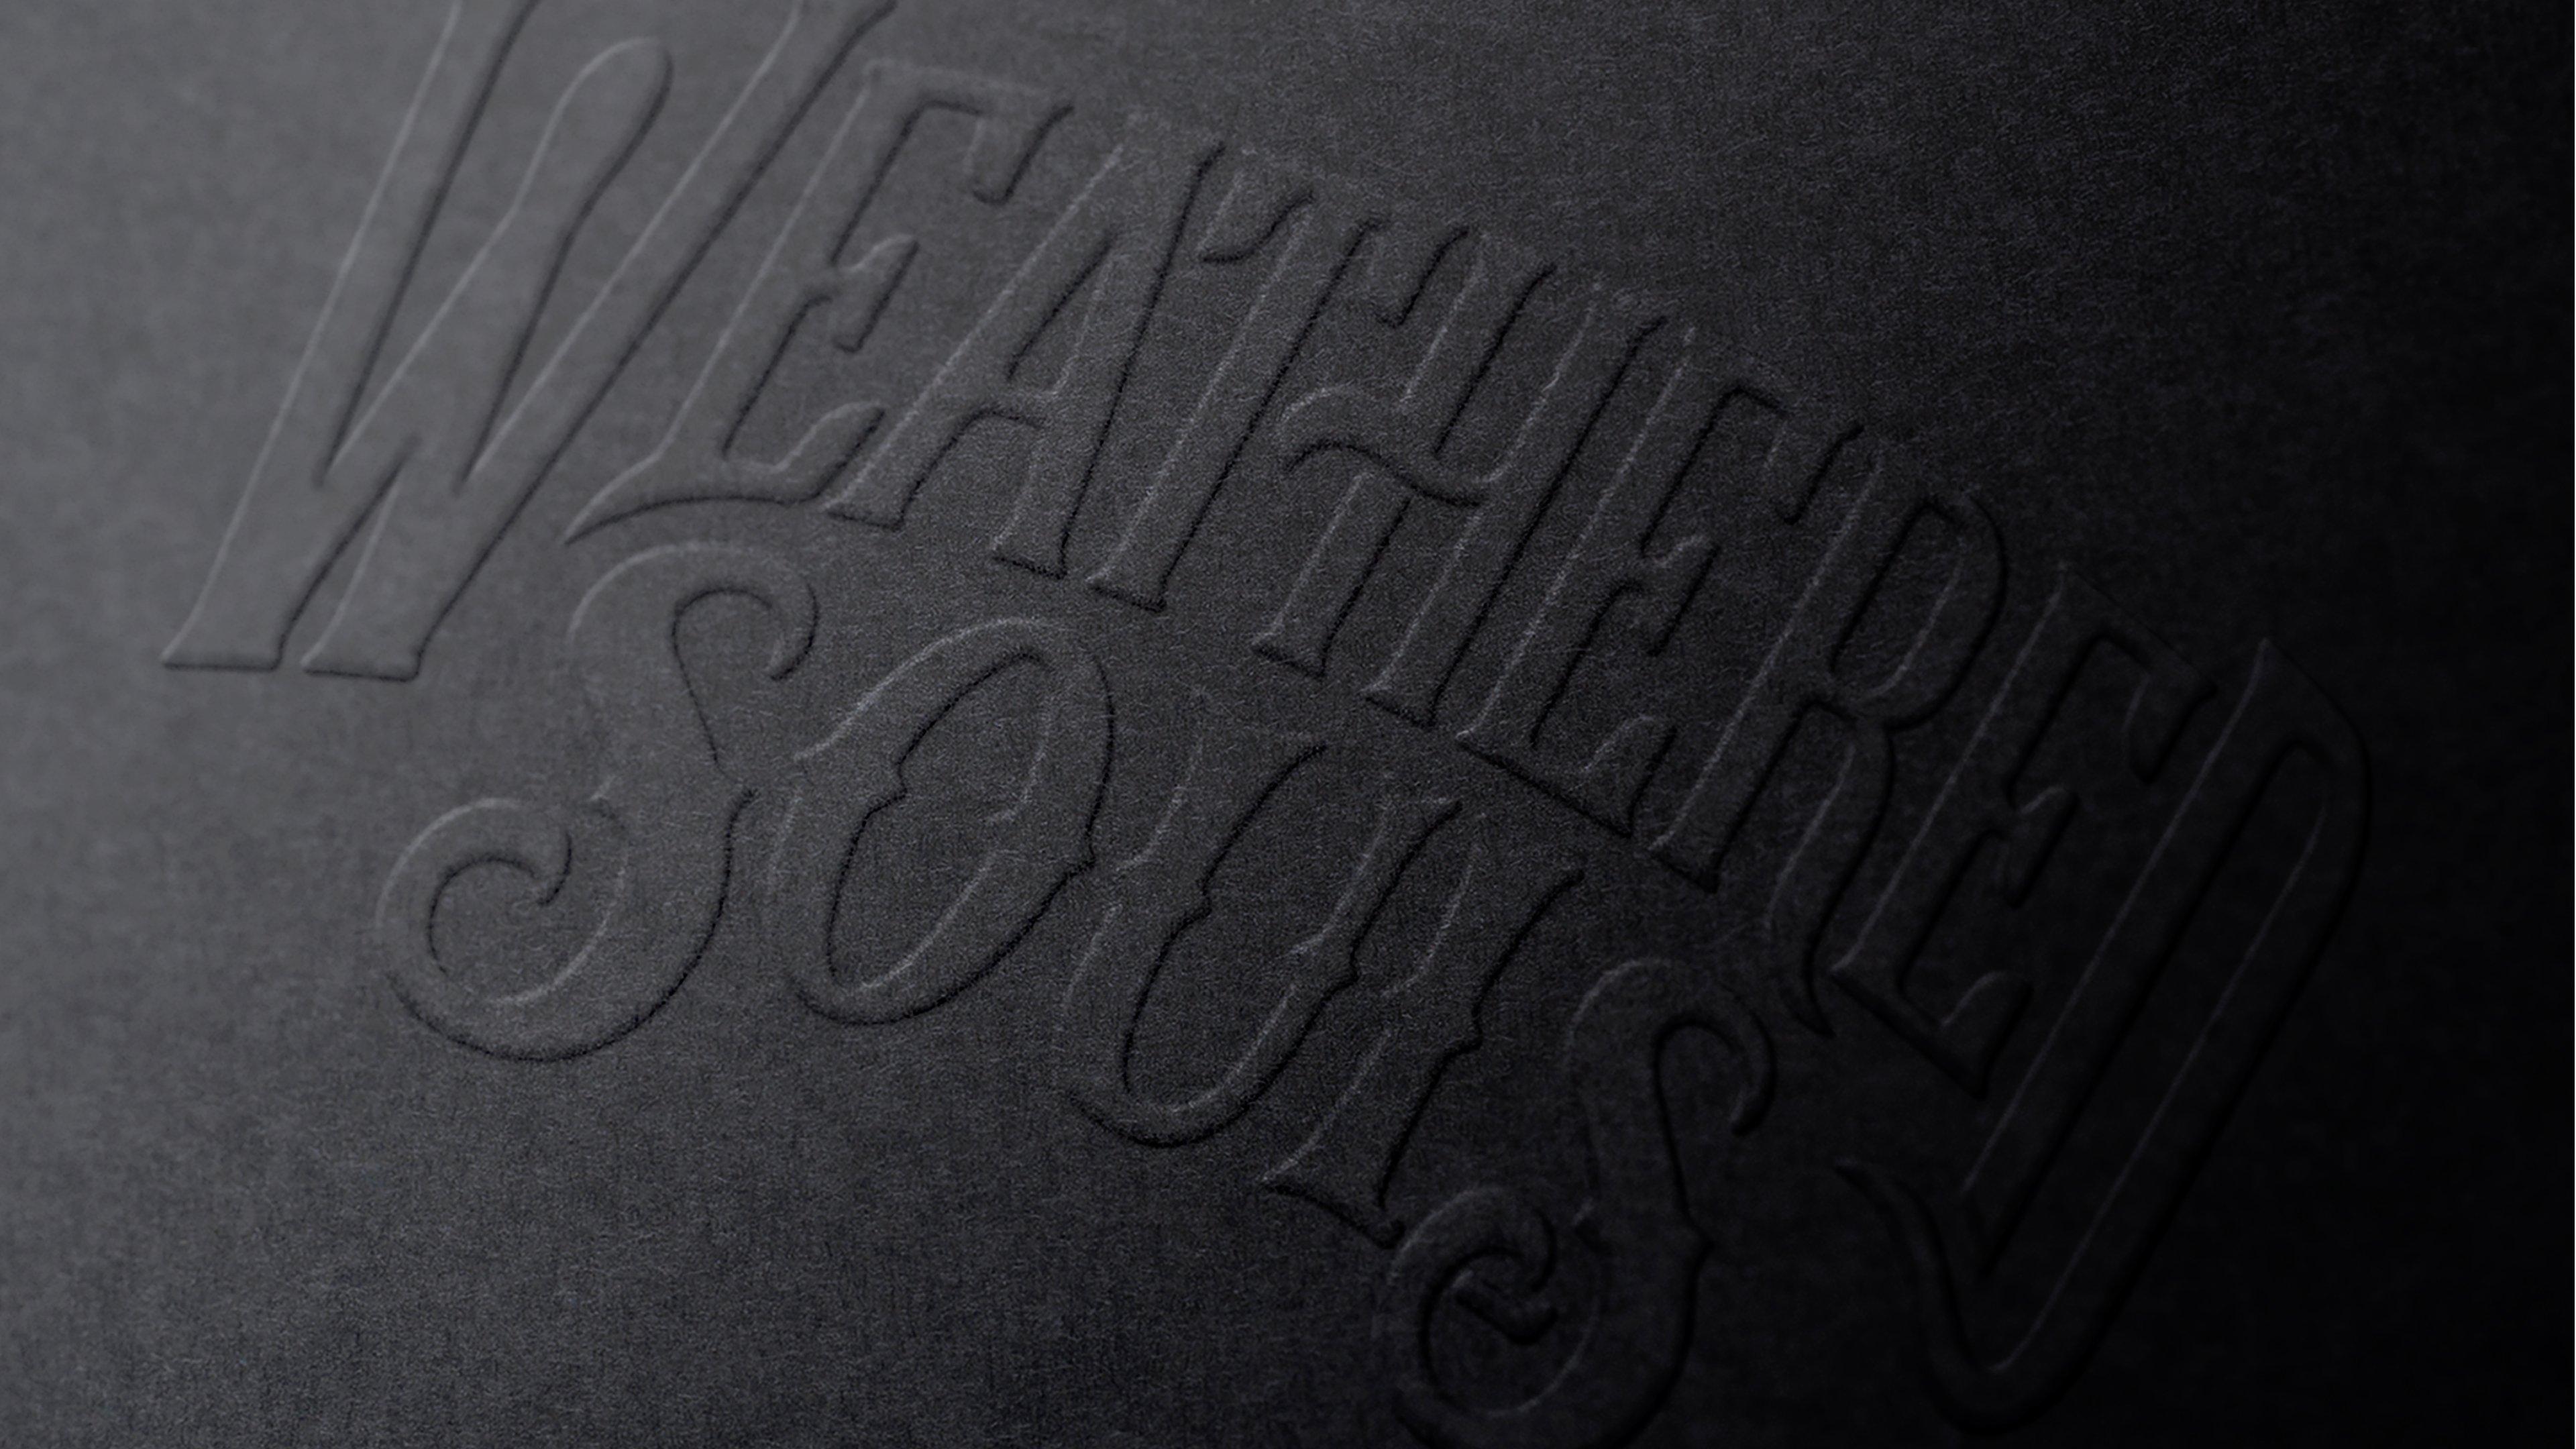 Weathered Souls Logo